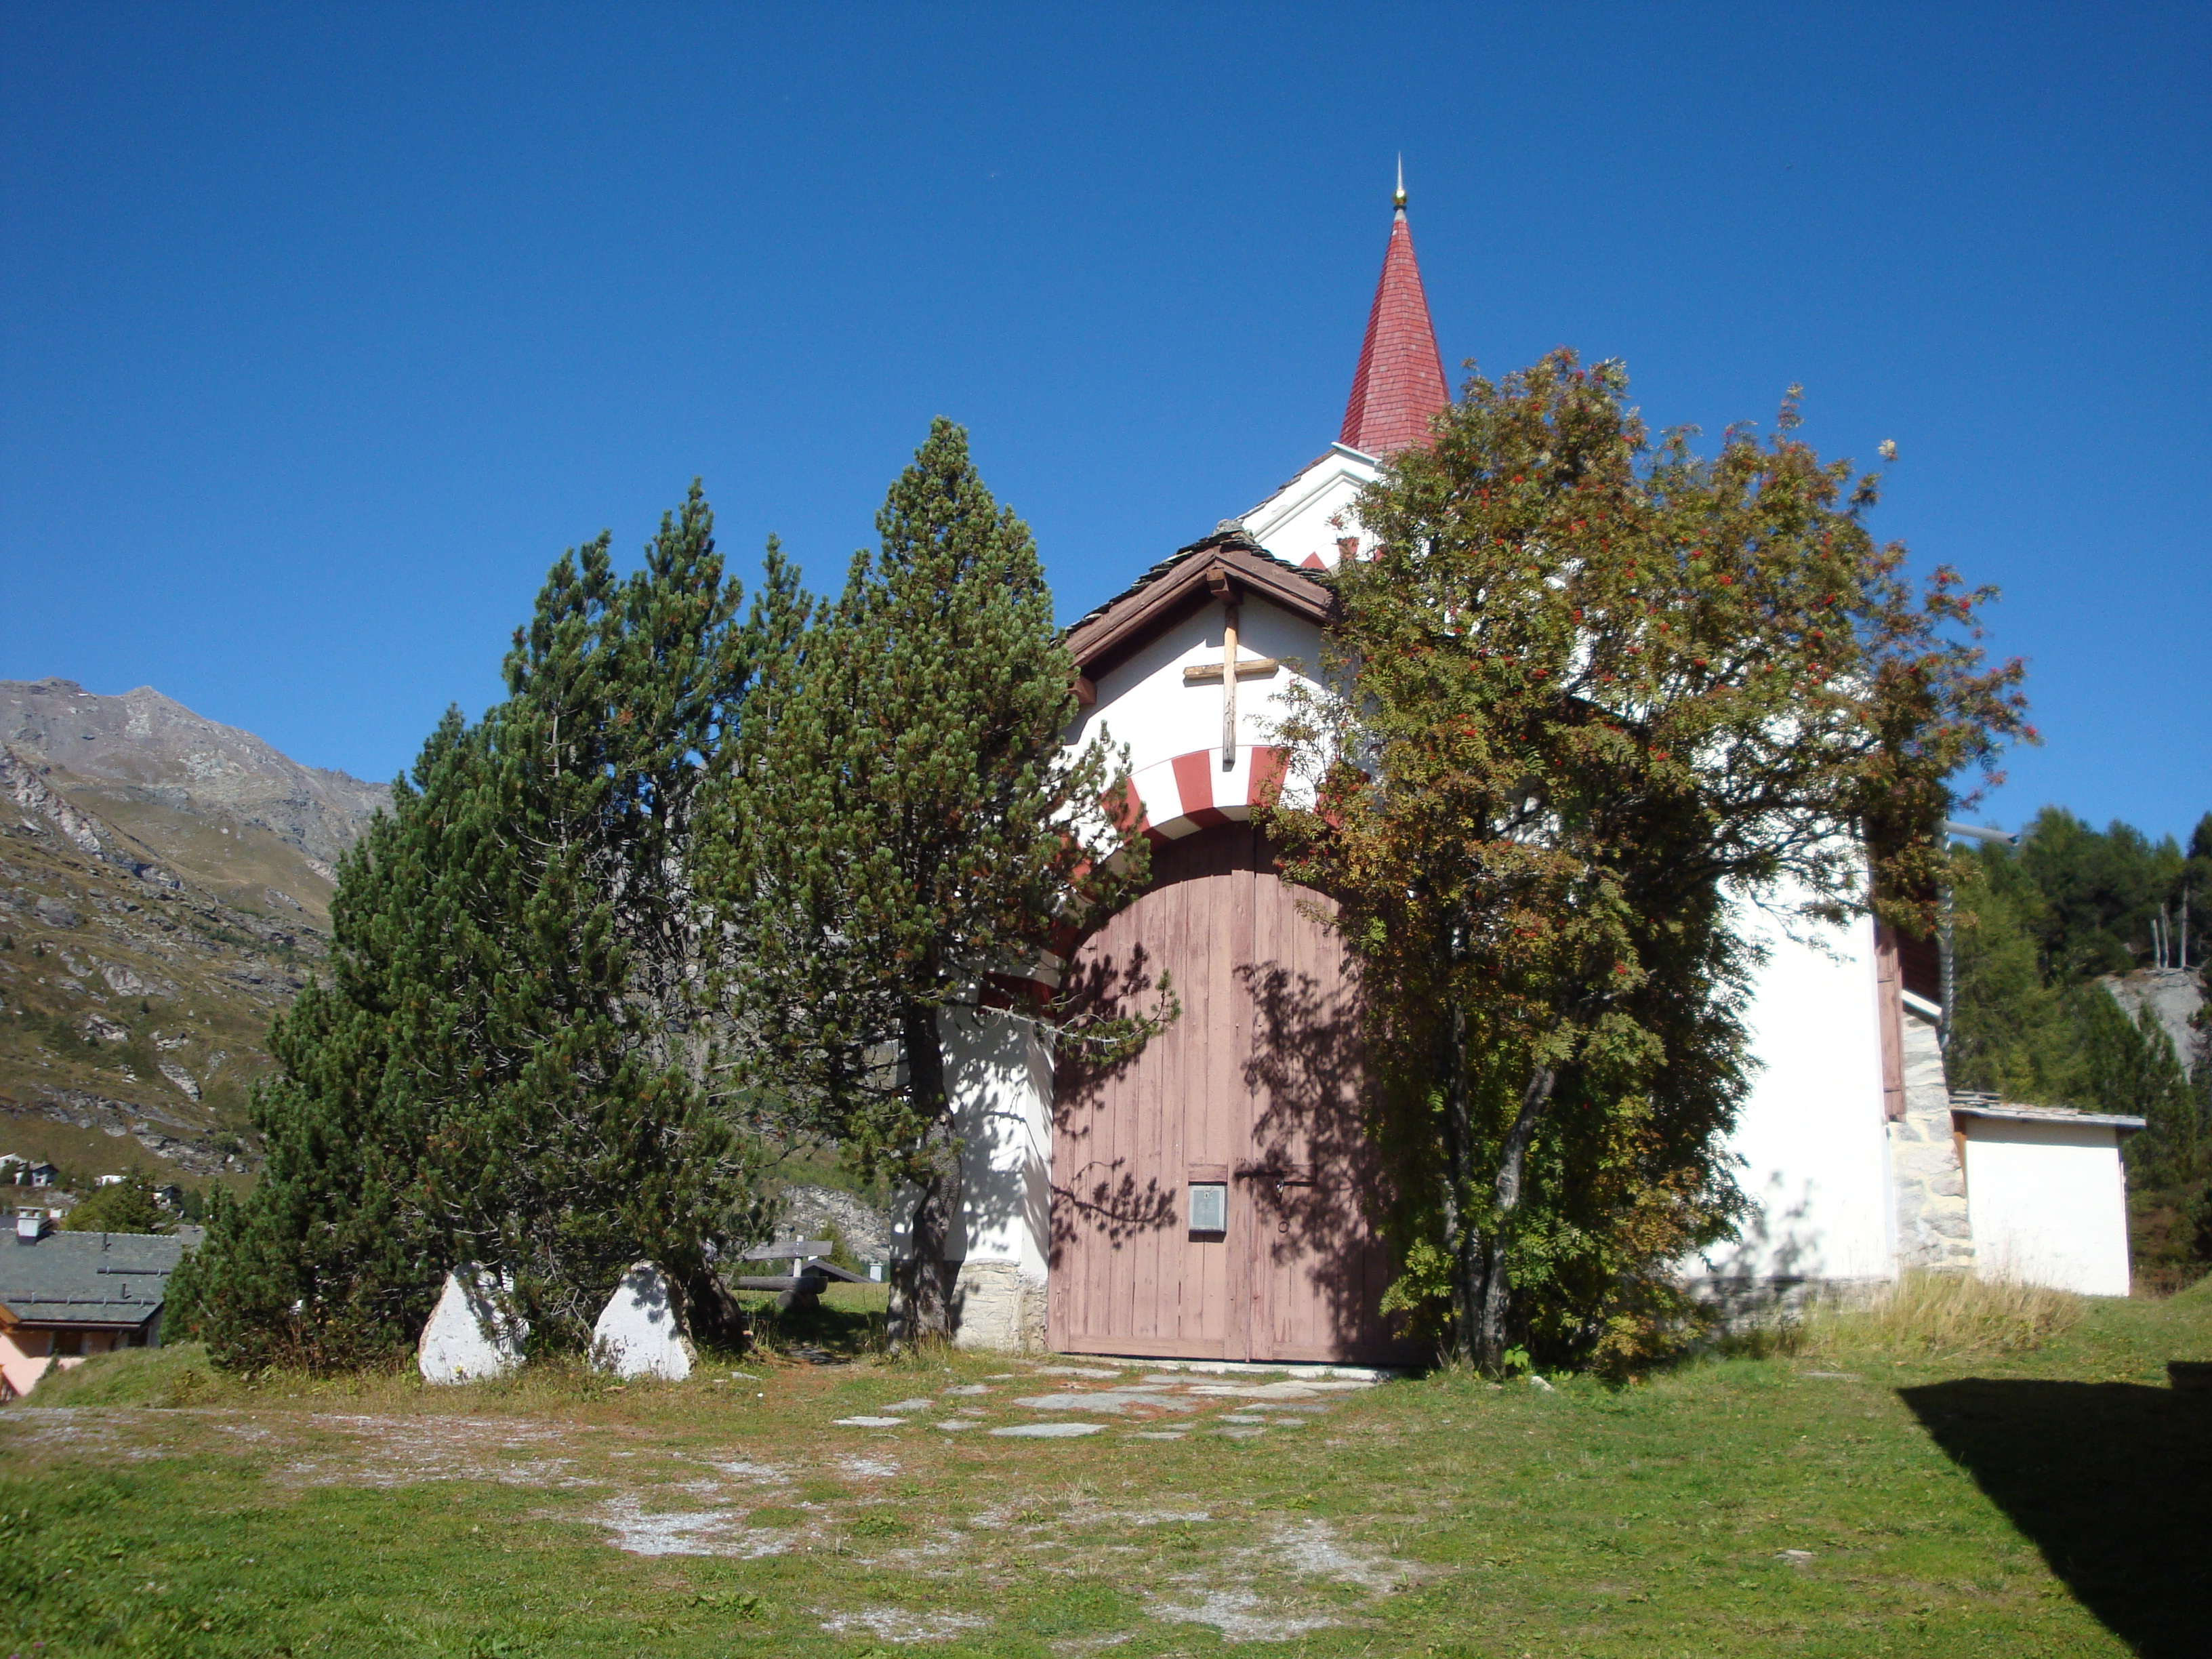 Chiesa Bianca, the White Church Slide 2